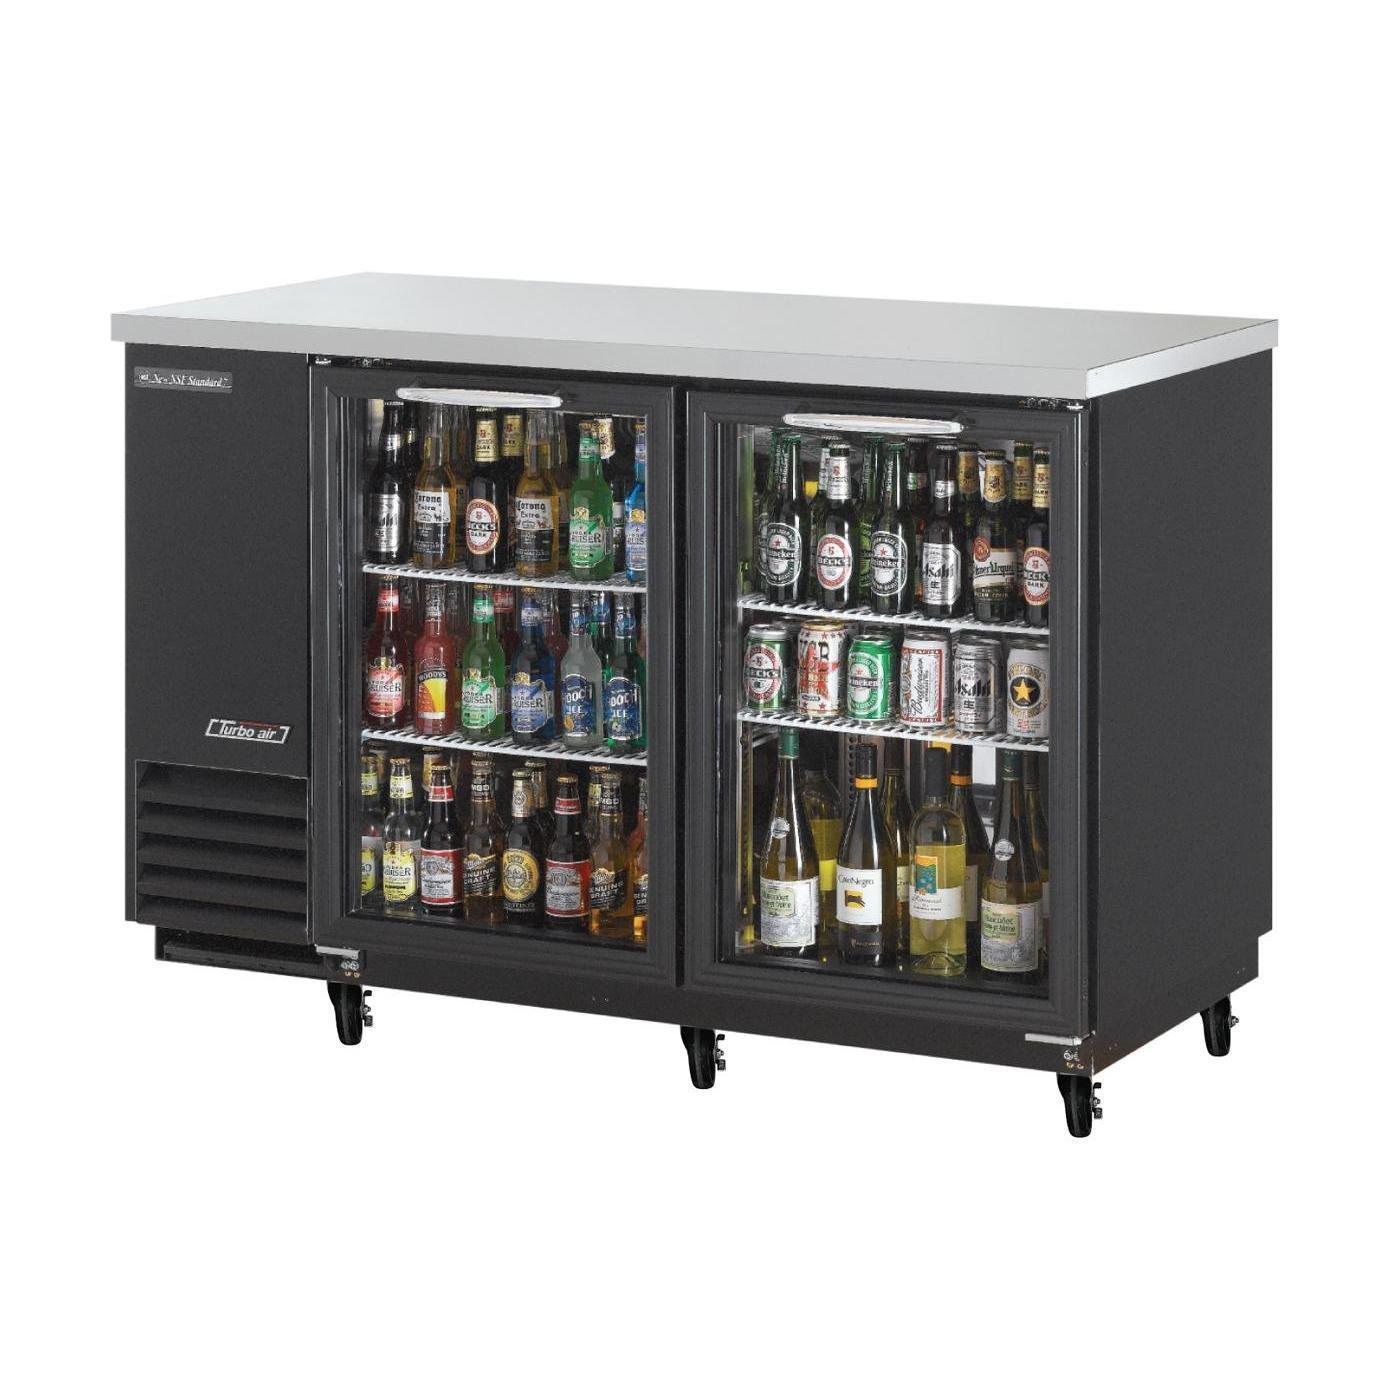 Amazon.com: Turbo Air TBB 2SG 58in 2 Glass Door Back Bar Cooler: Appliances